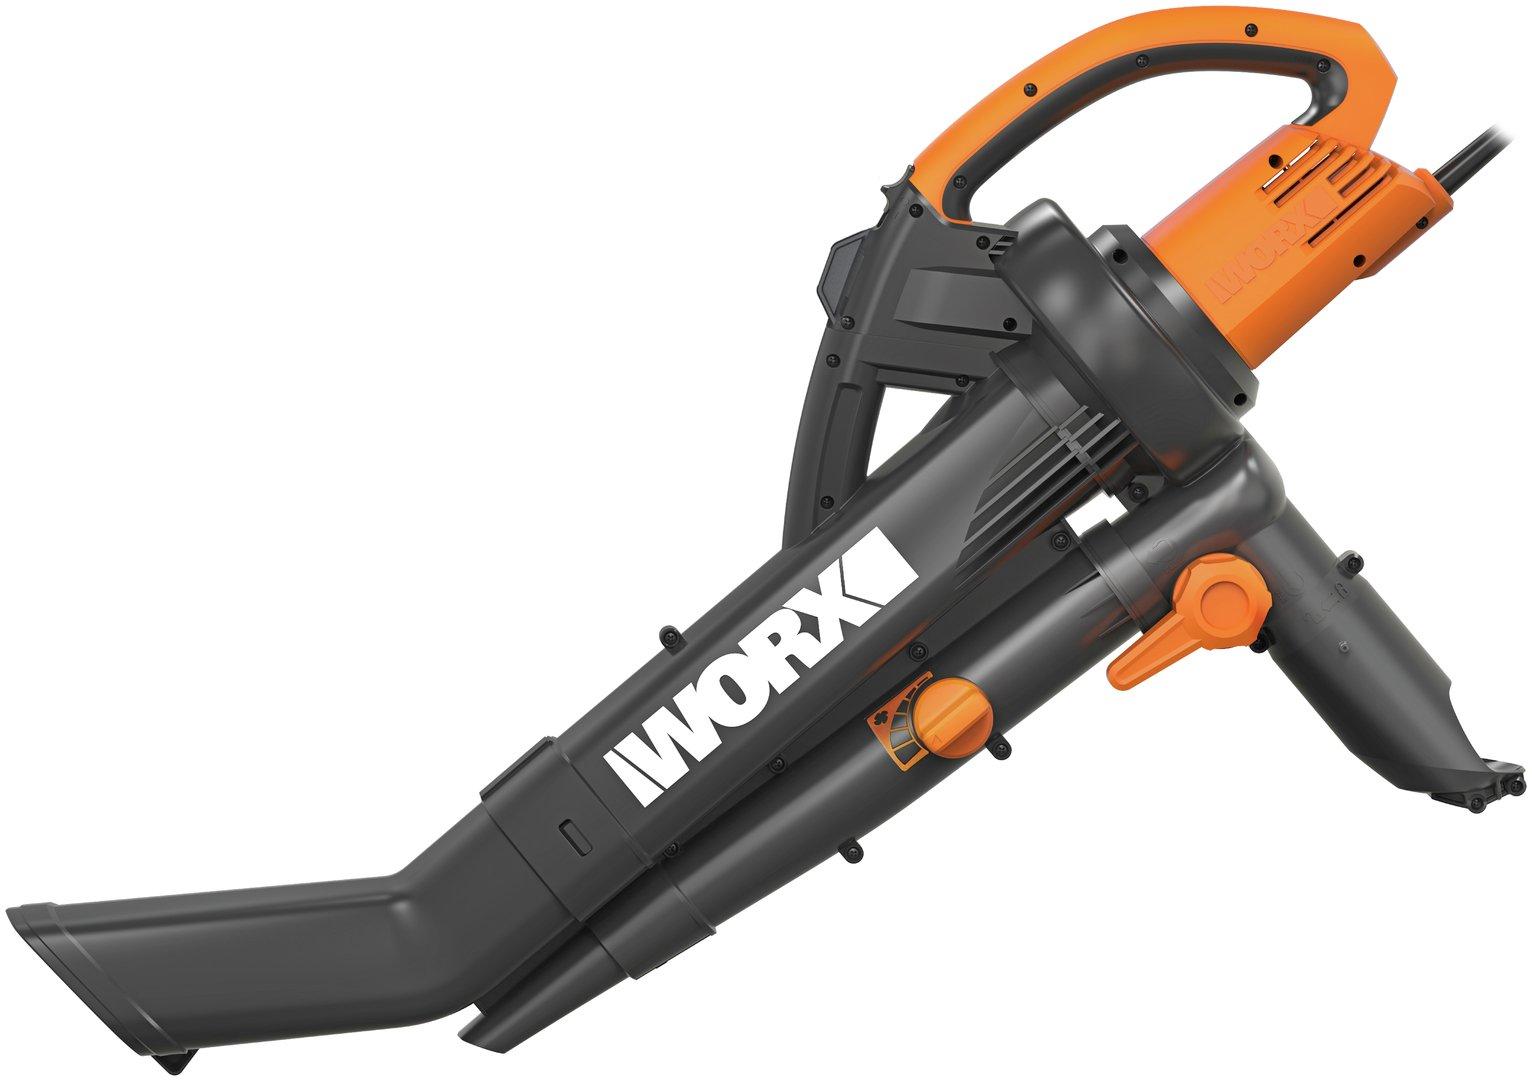 Worx Wg501e Trivac Garden Vacuum 3000w